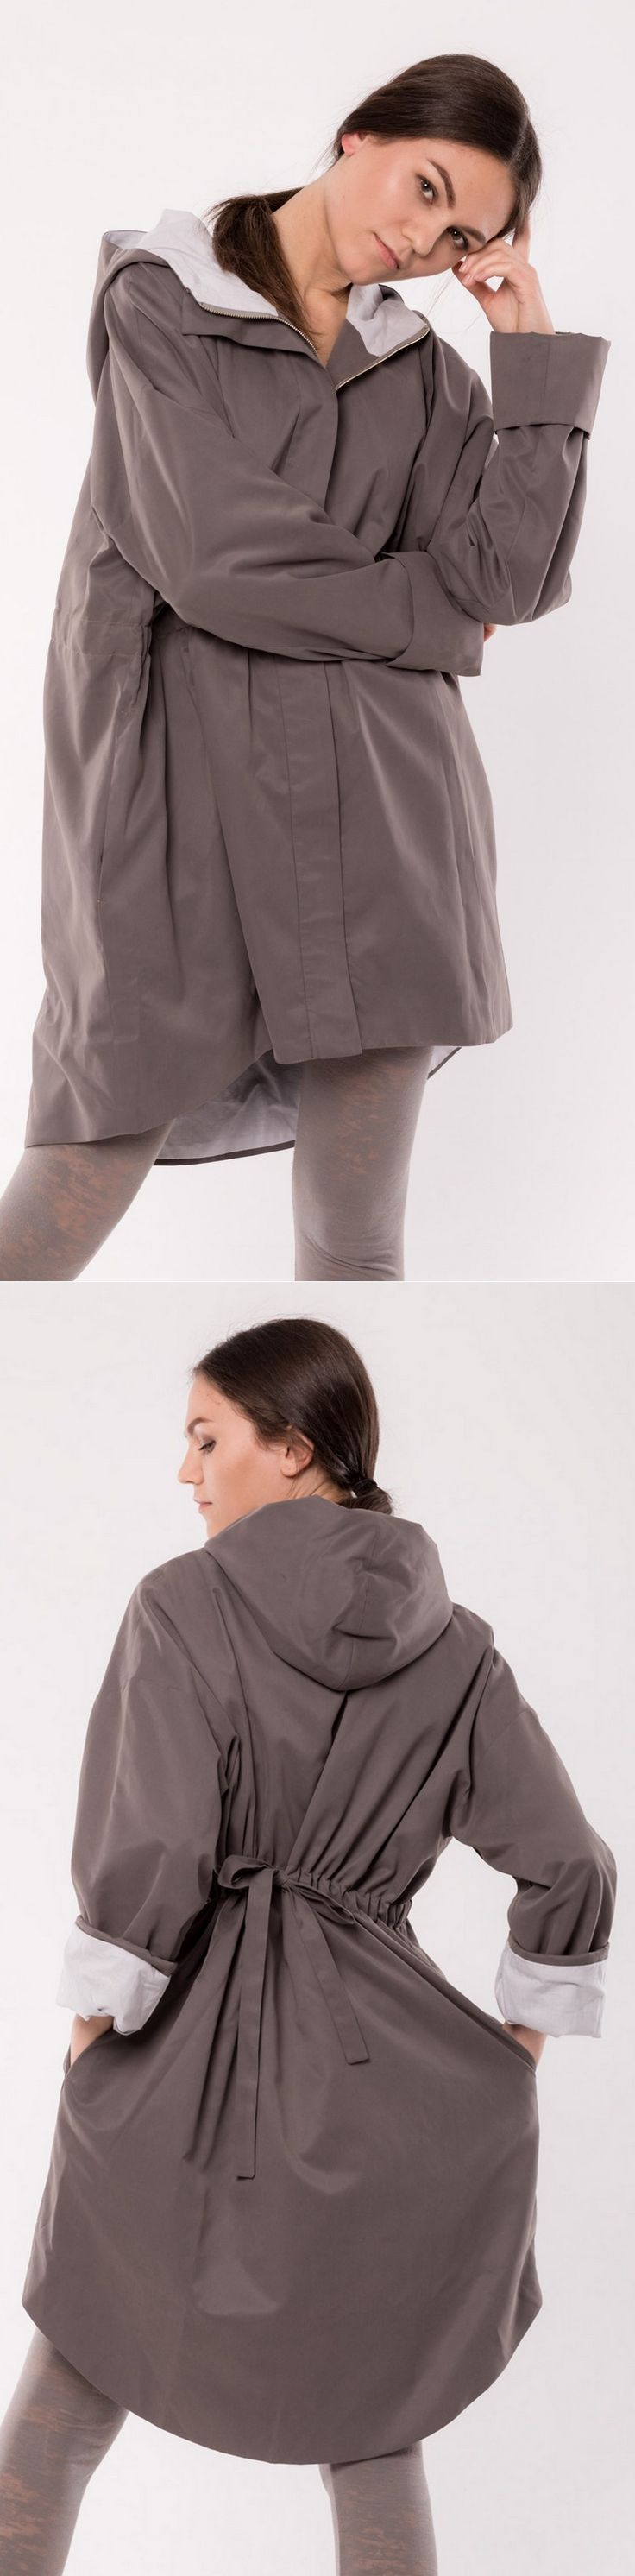 Fludra Slow Fashion oversize waterproof trench coat, designer Anna Fludra